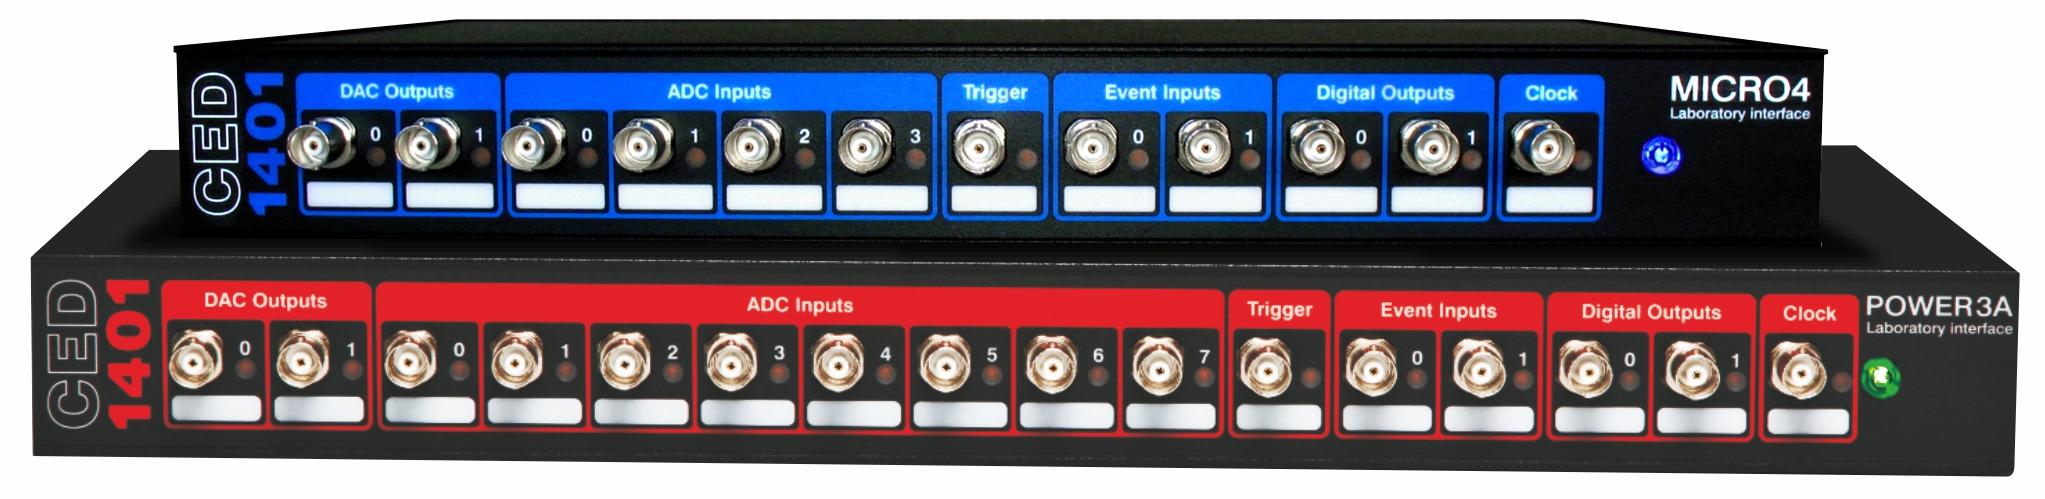 Power1401 Micro1401